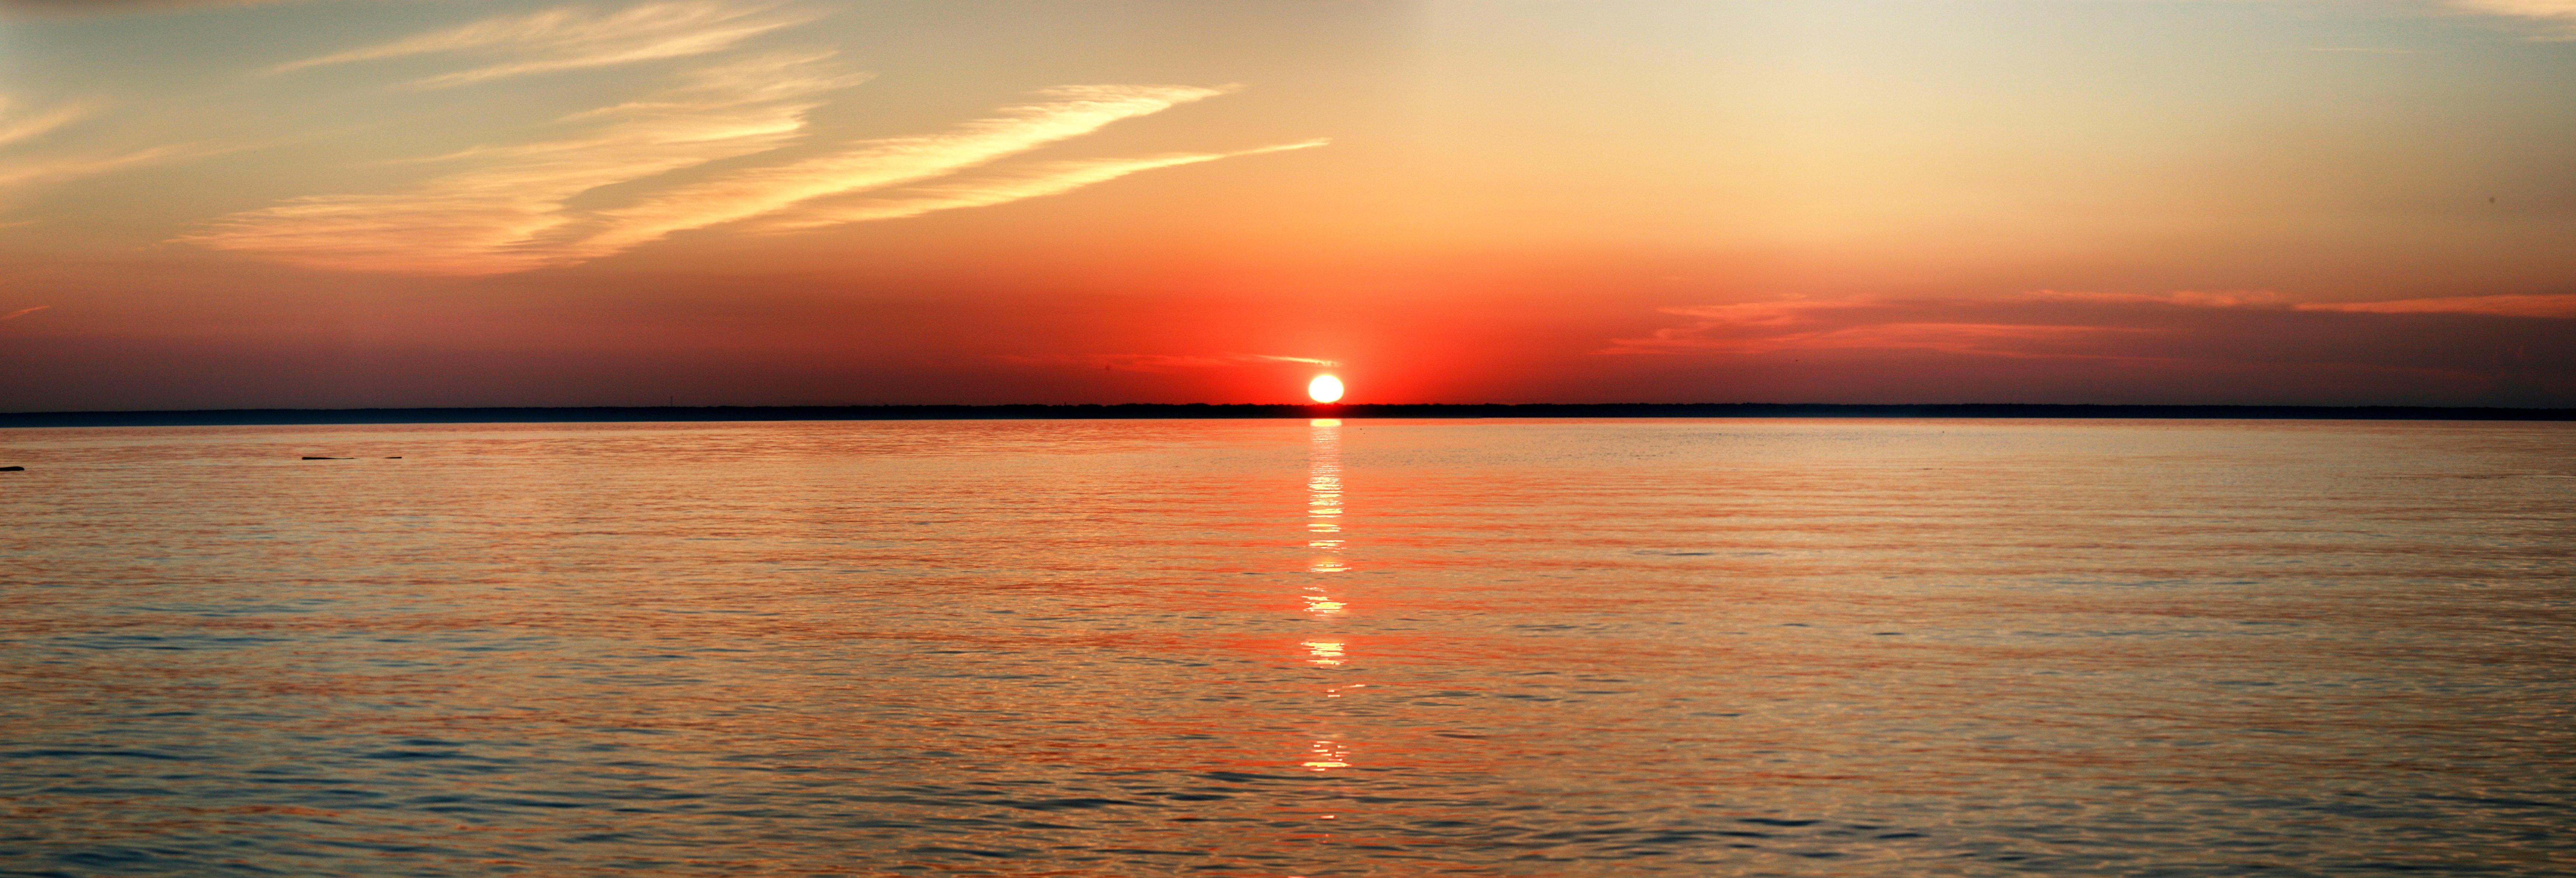 Sunset on the edge of ocean photo